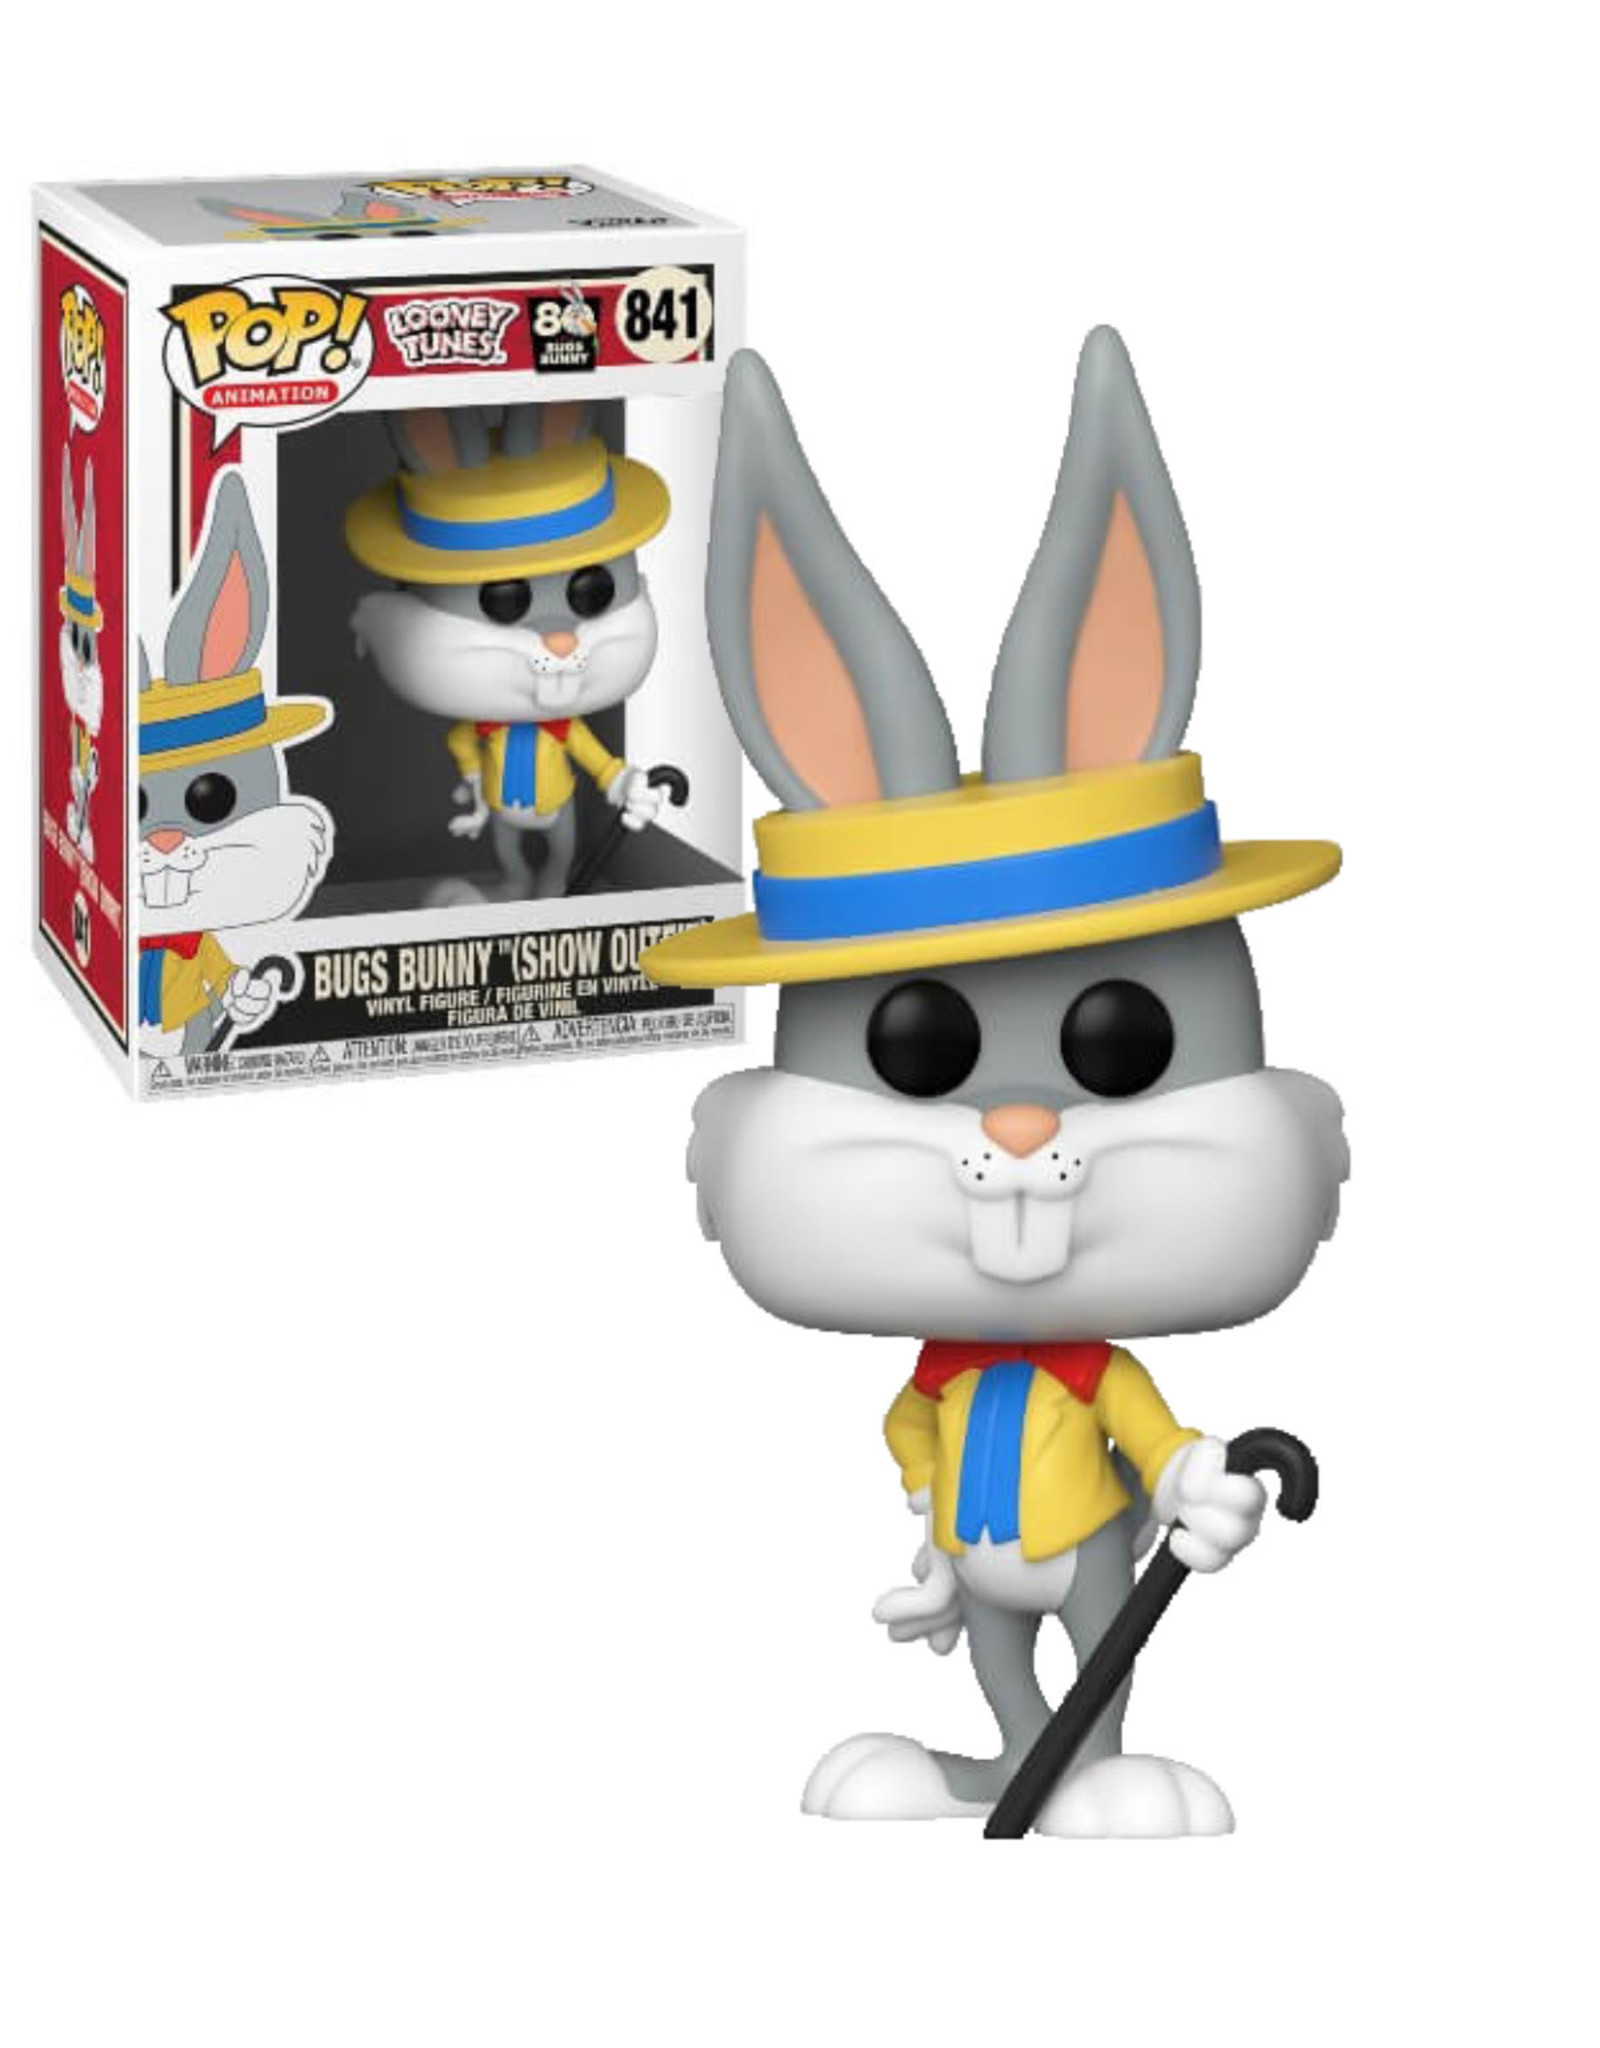 Looney Tunes 841 ( Funko Pop ) Bugs Bunny